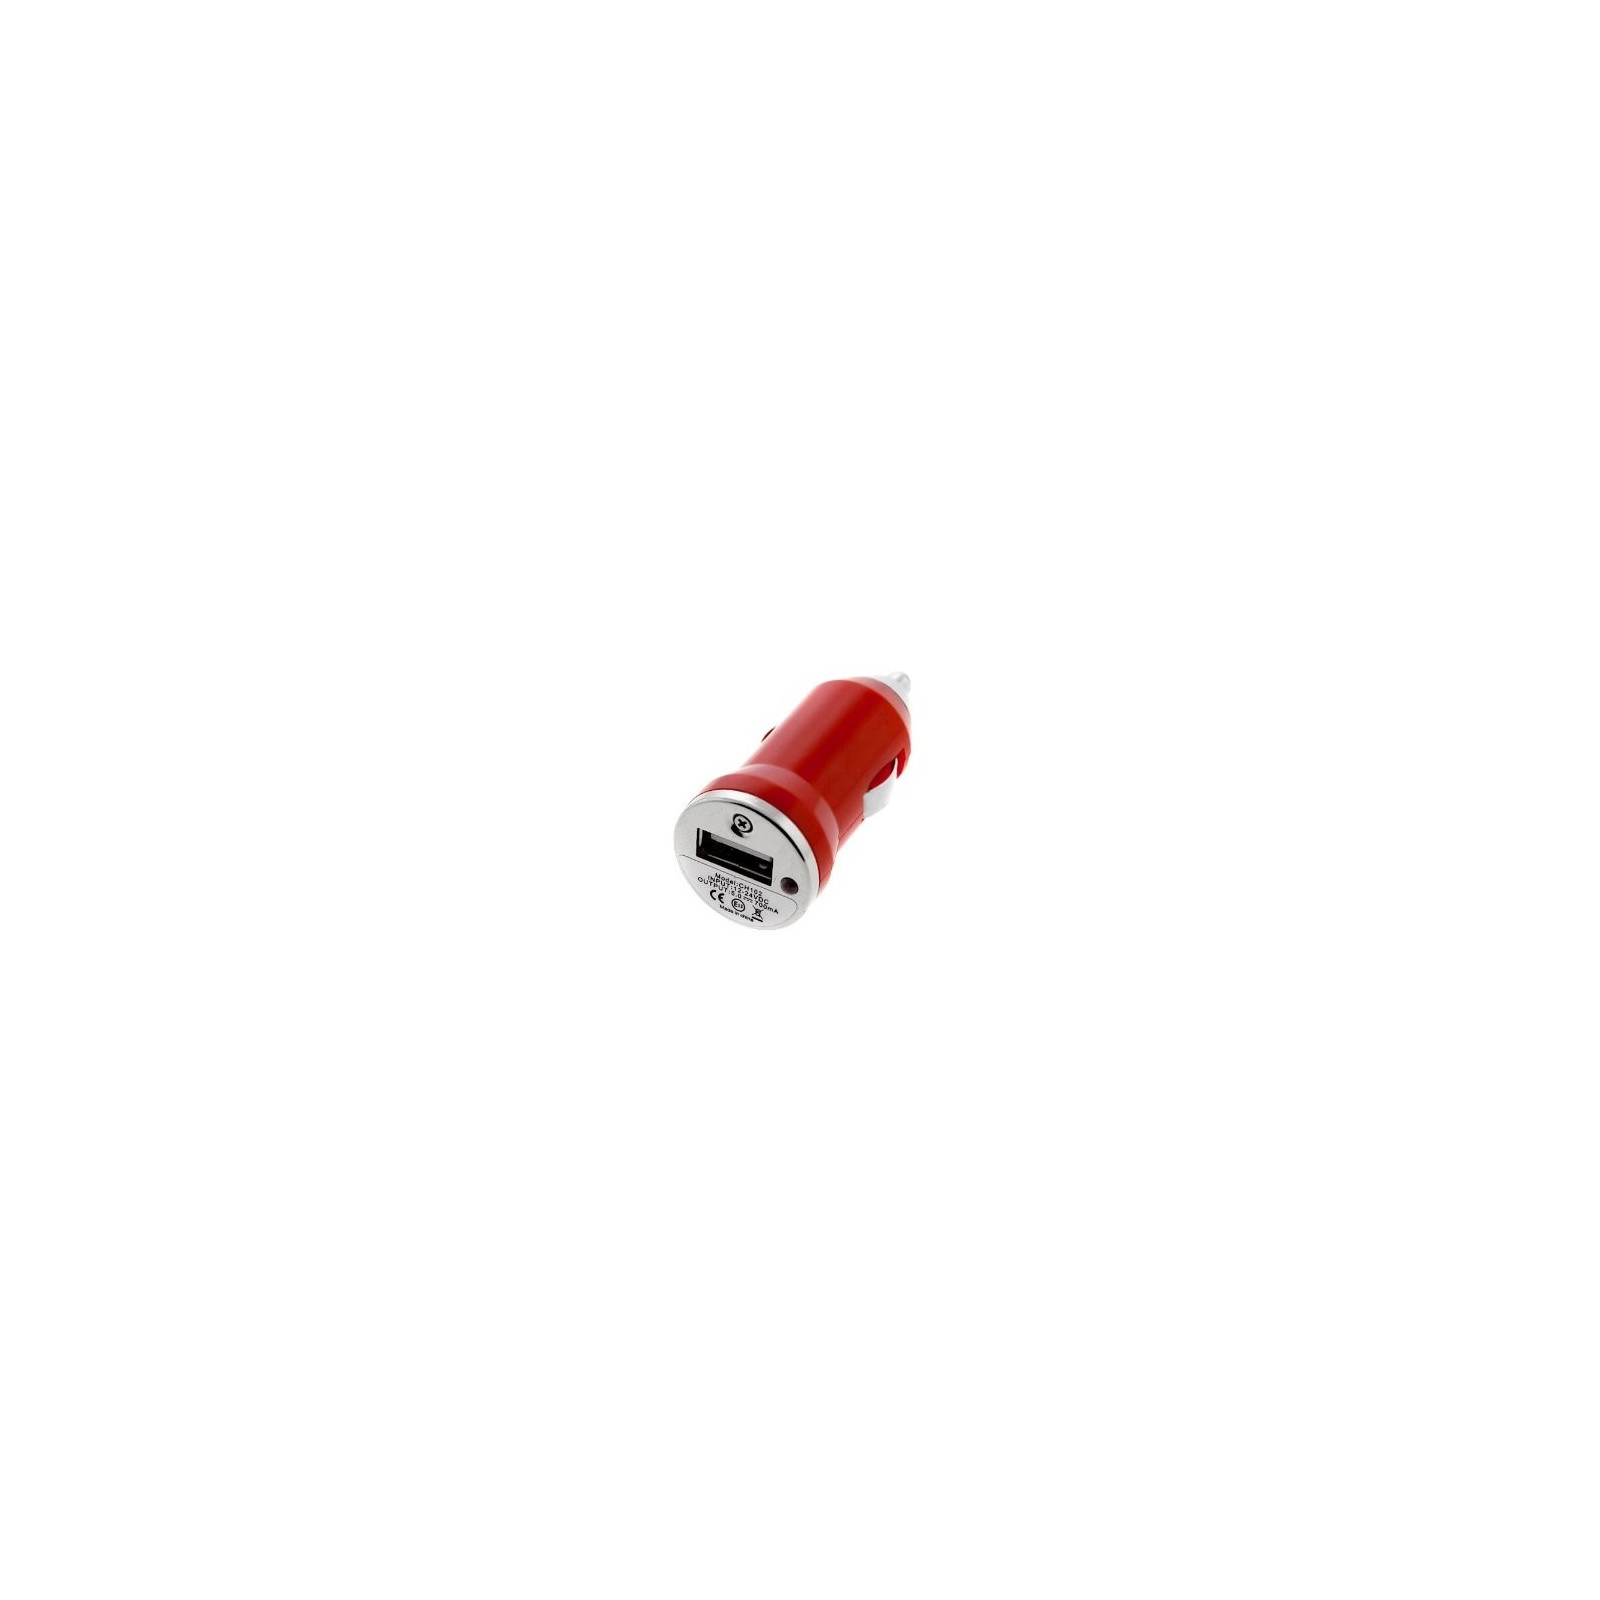 CARGADOR COCHE MOVIL USB IPAD IPHONE SAMSUNG LG HTC NOKIA TABLET HUAWEI ROJO ARREGLATELO - 1